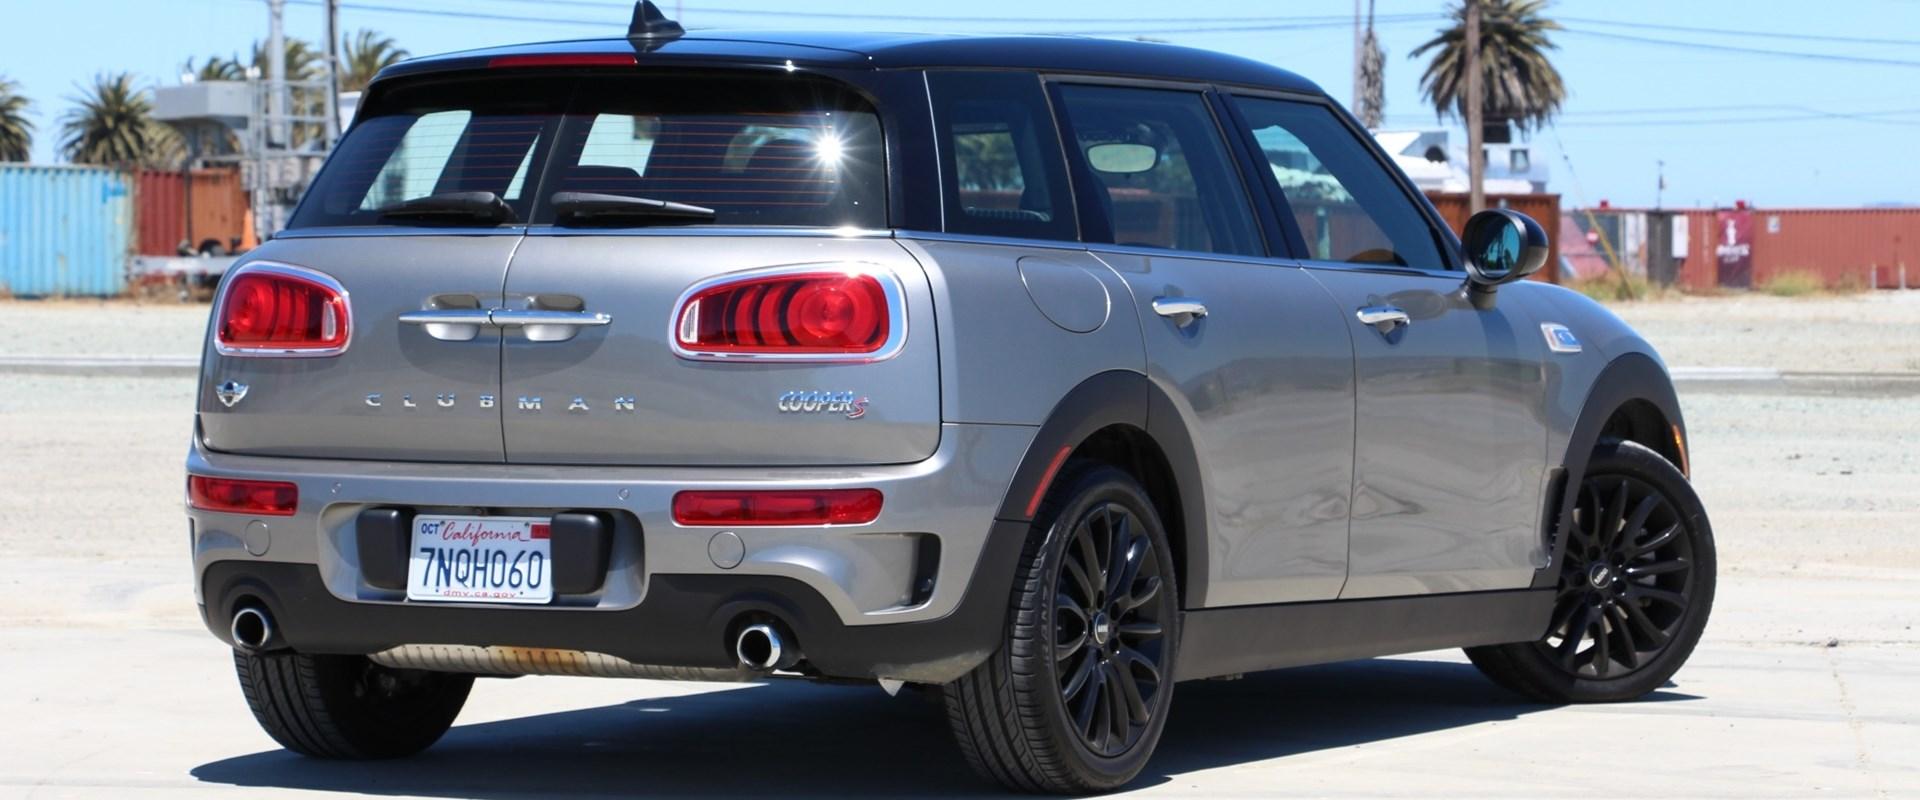 Mini mini cooper crossover : 2016 Mini Cooper Clubman S Review: The Car To Ditch Your Crossover ...